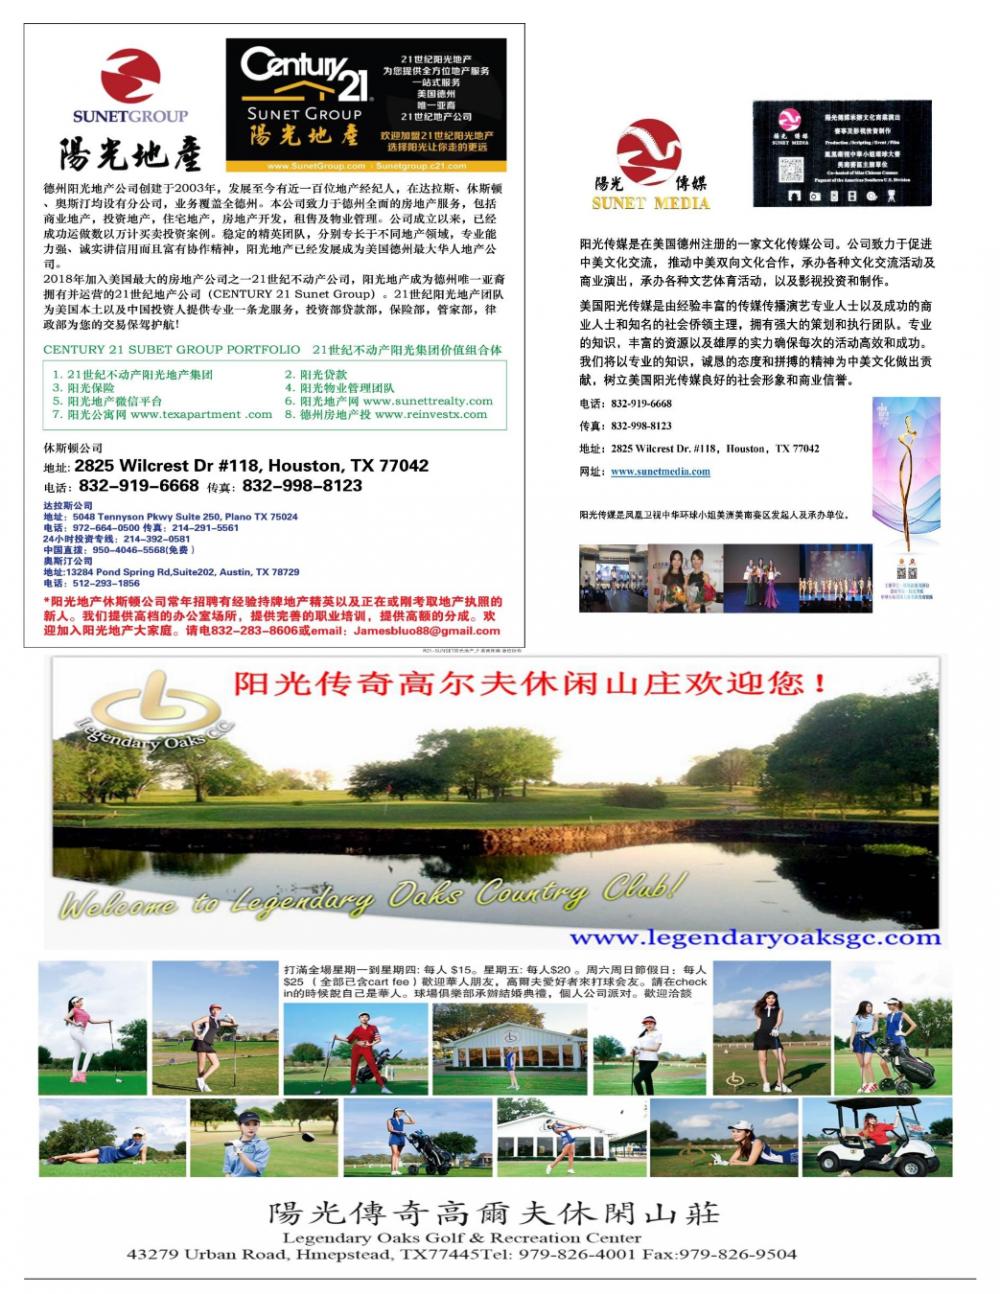 Century 21 - SUNET GROUP 陽光地產